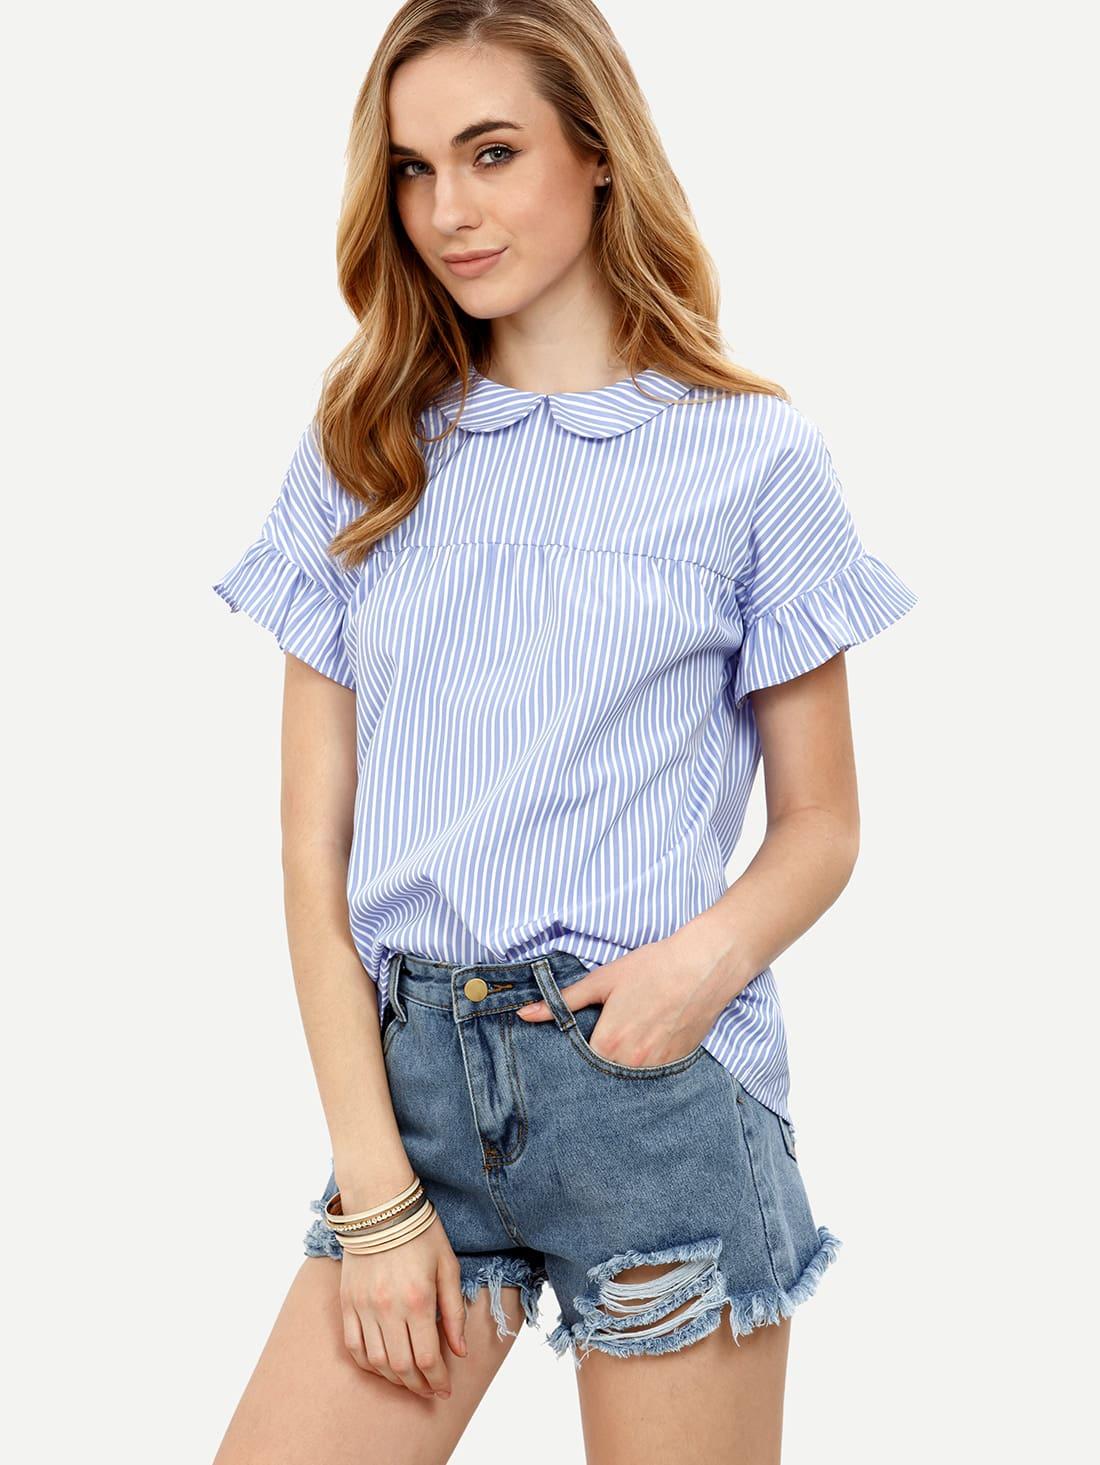 blue striped peter pan collar short sleeve blousefor women. Black Bedroom Furniture Sets. Home Design Ideas